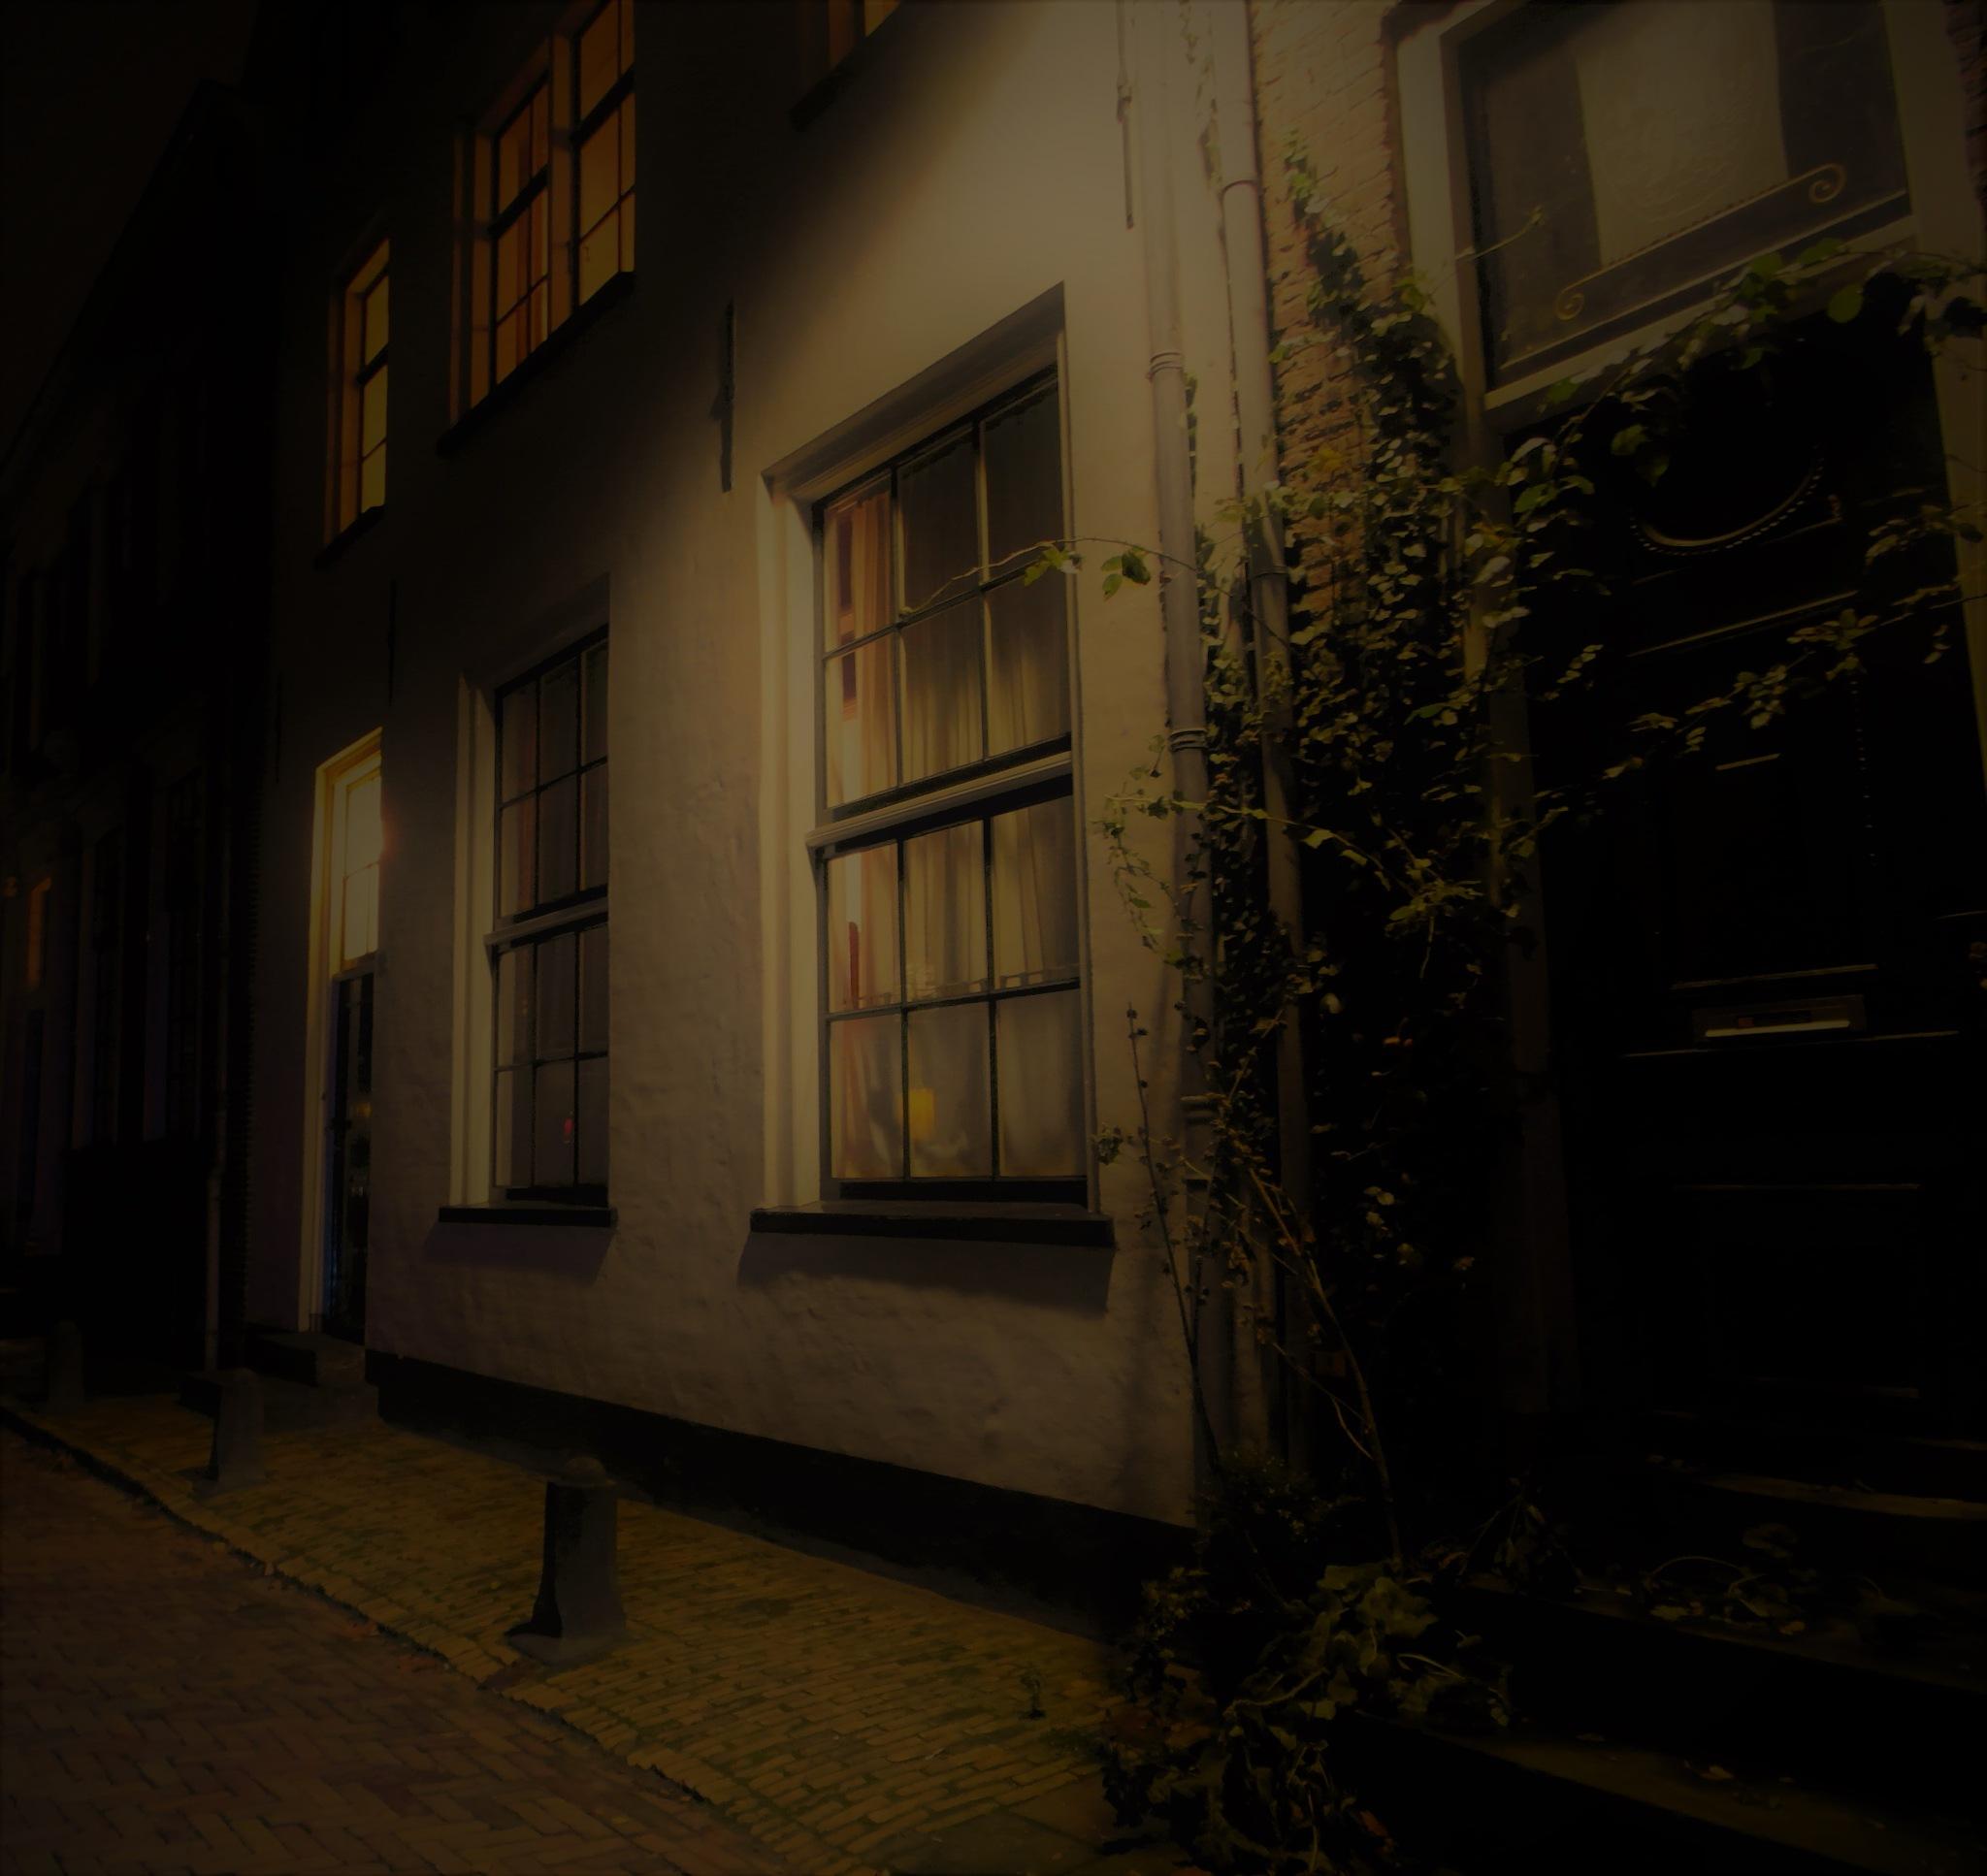 Zutphen The Netherlands by Ber te Mebel